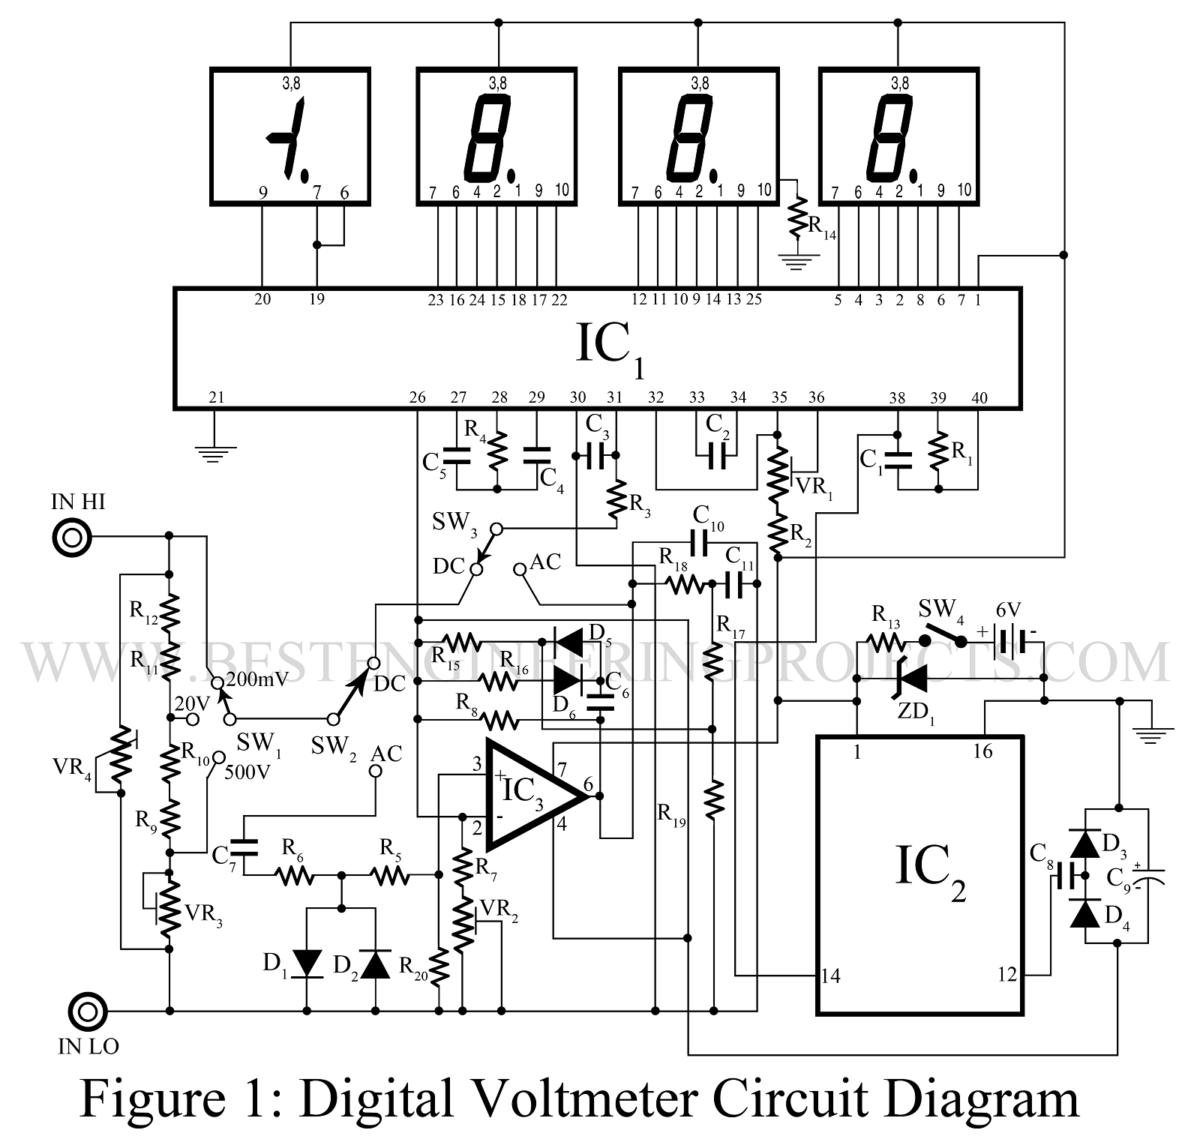 Digital Voltmeter (DVM) Circuit